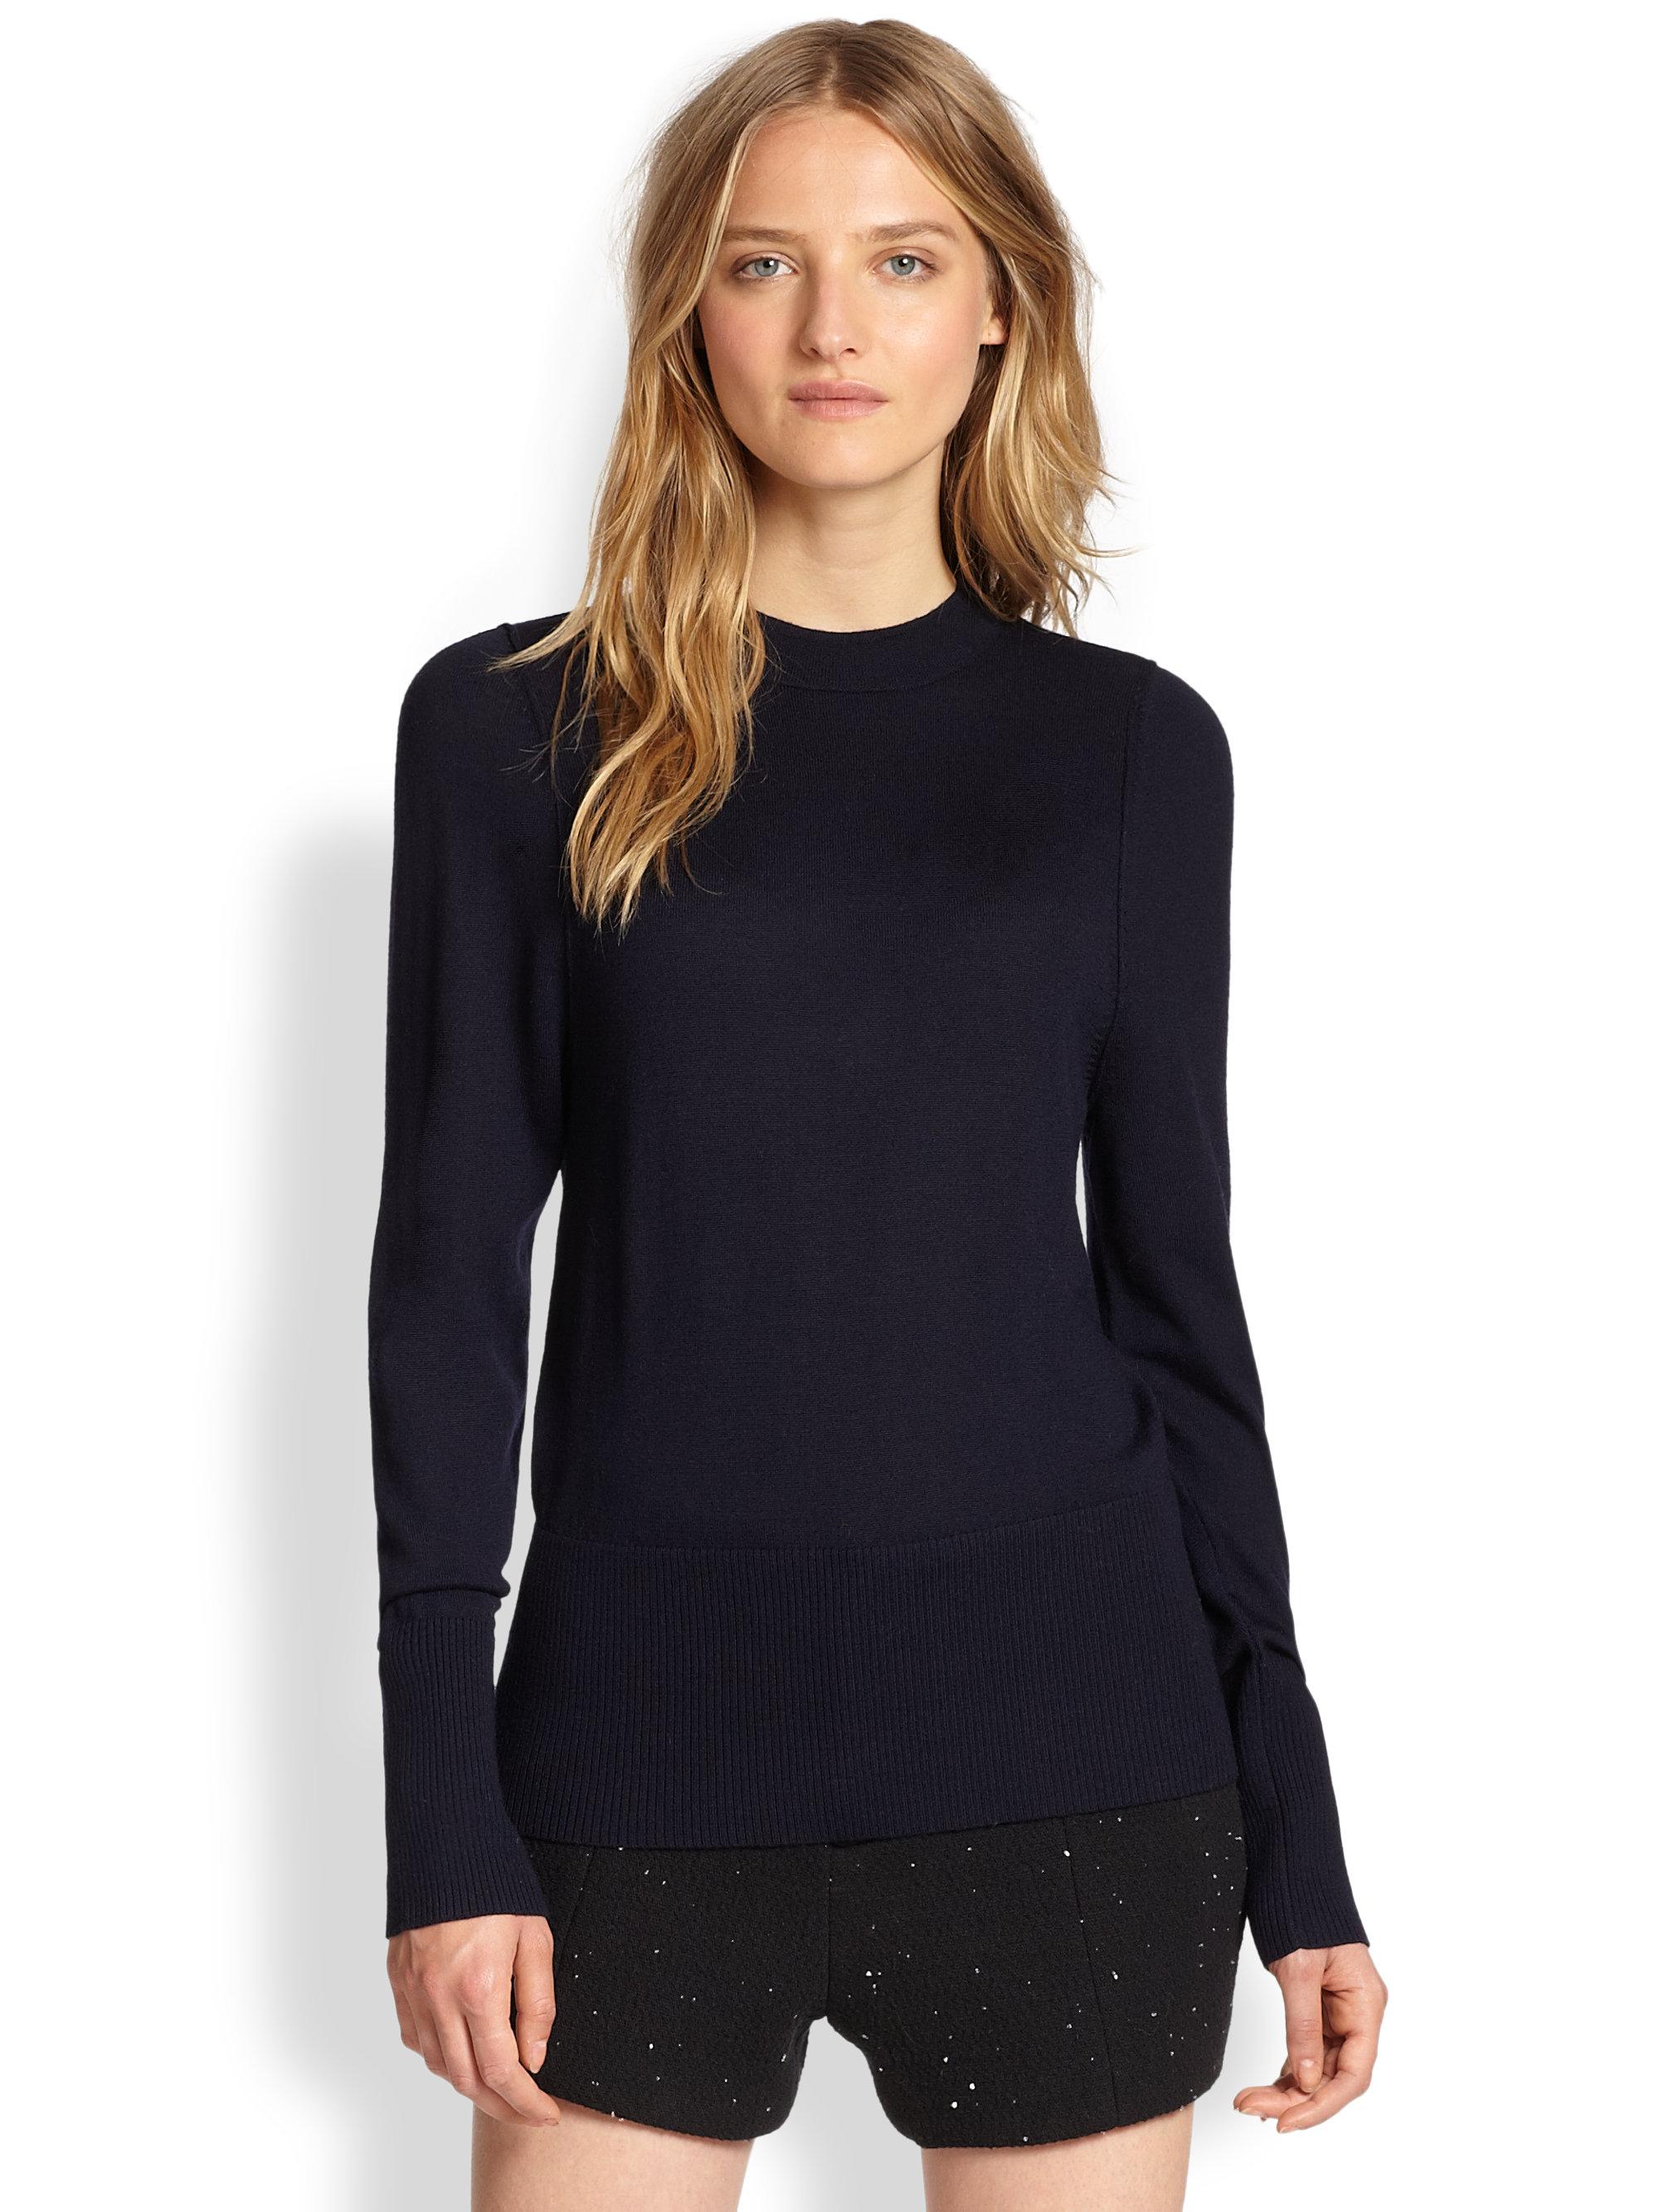 Wool Sweater Grey: Rag & Bone Sydney Mock-turtleneck Merino Wool